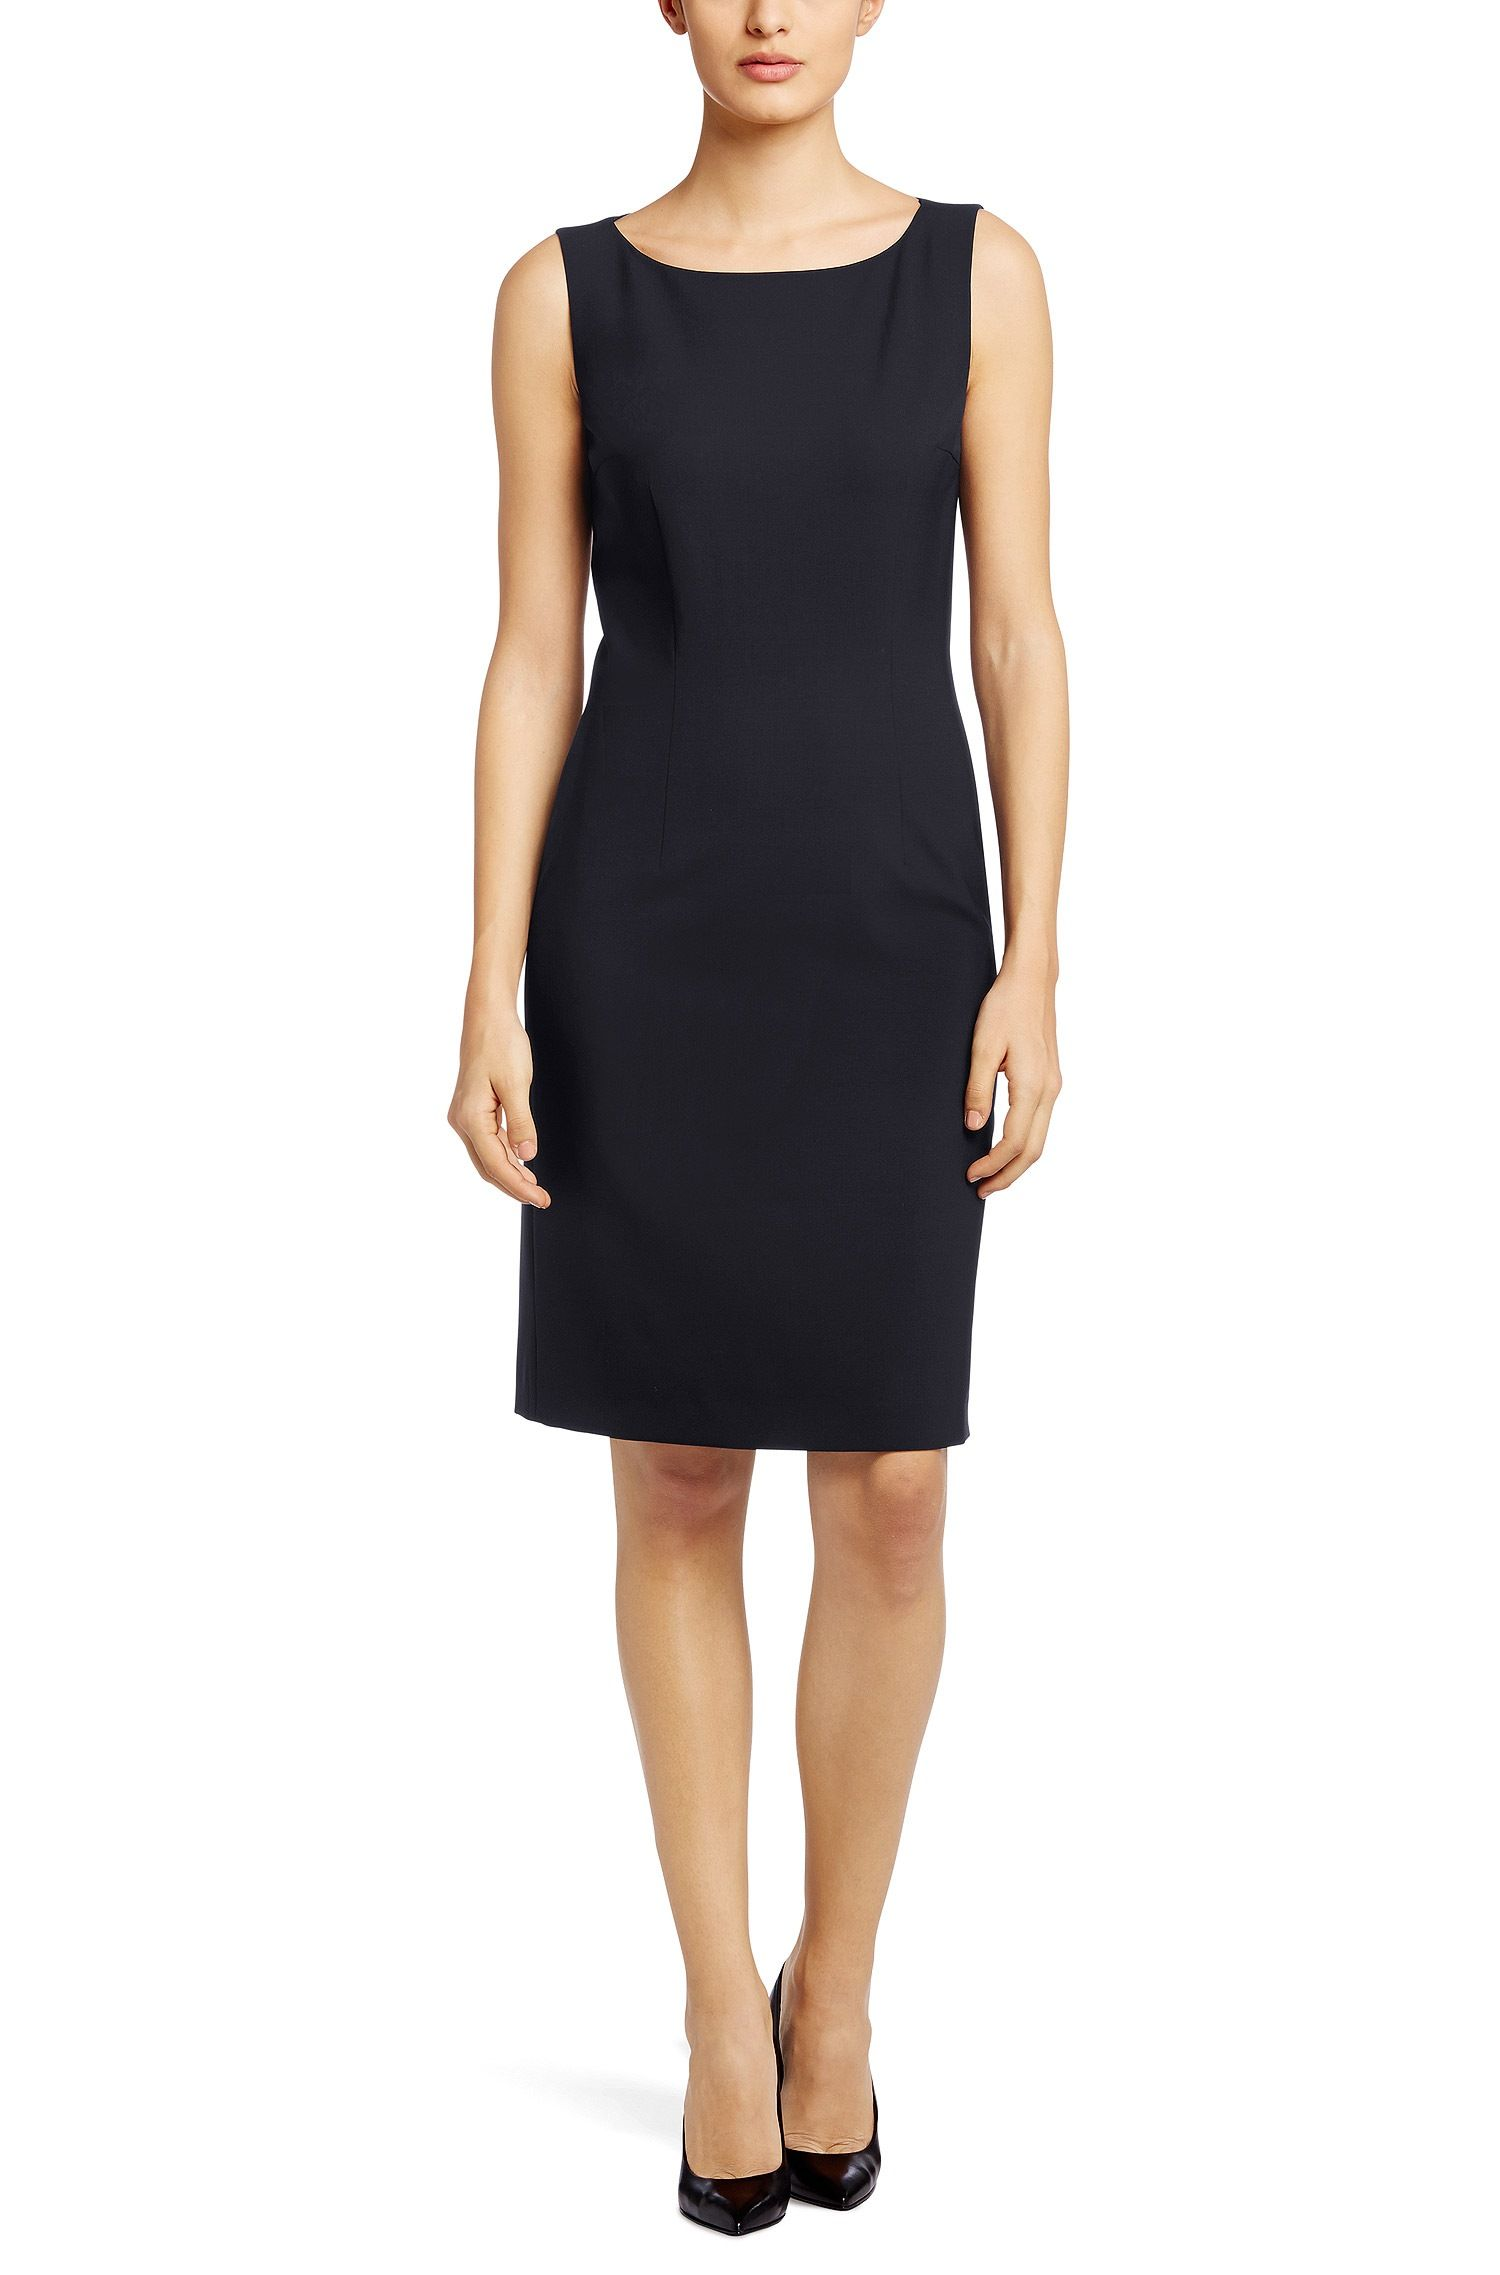 dress 'dinoma1' in a new wool blend | little black dress